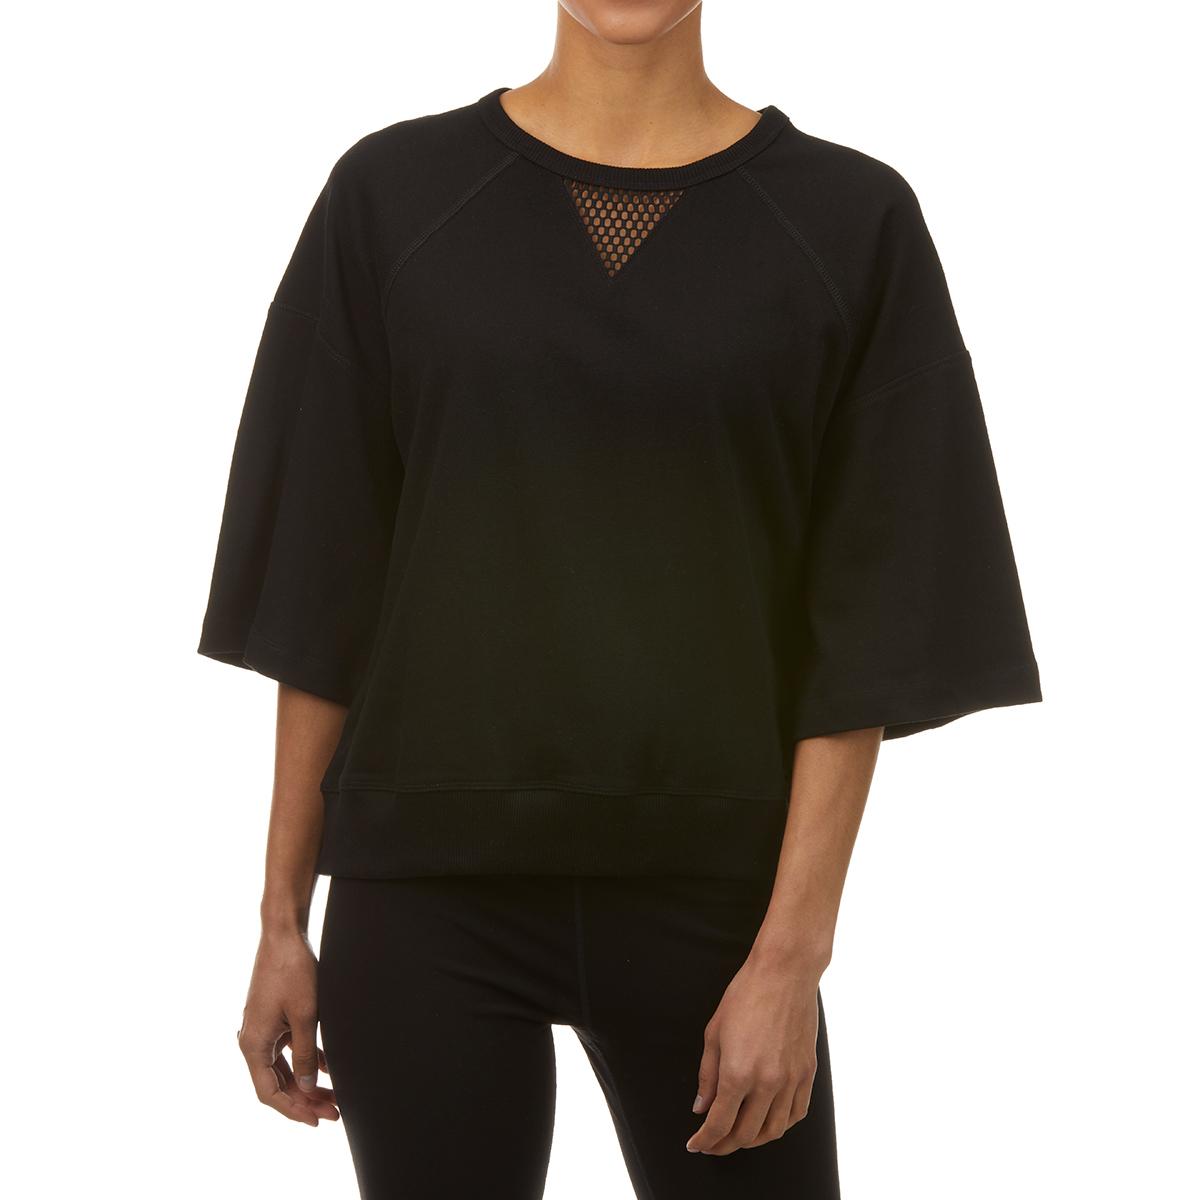 Calvin Klein Women's 3/4-Sleeve Performance Workout Sweatshirt - Black, L